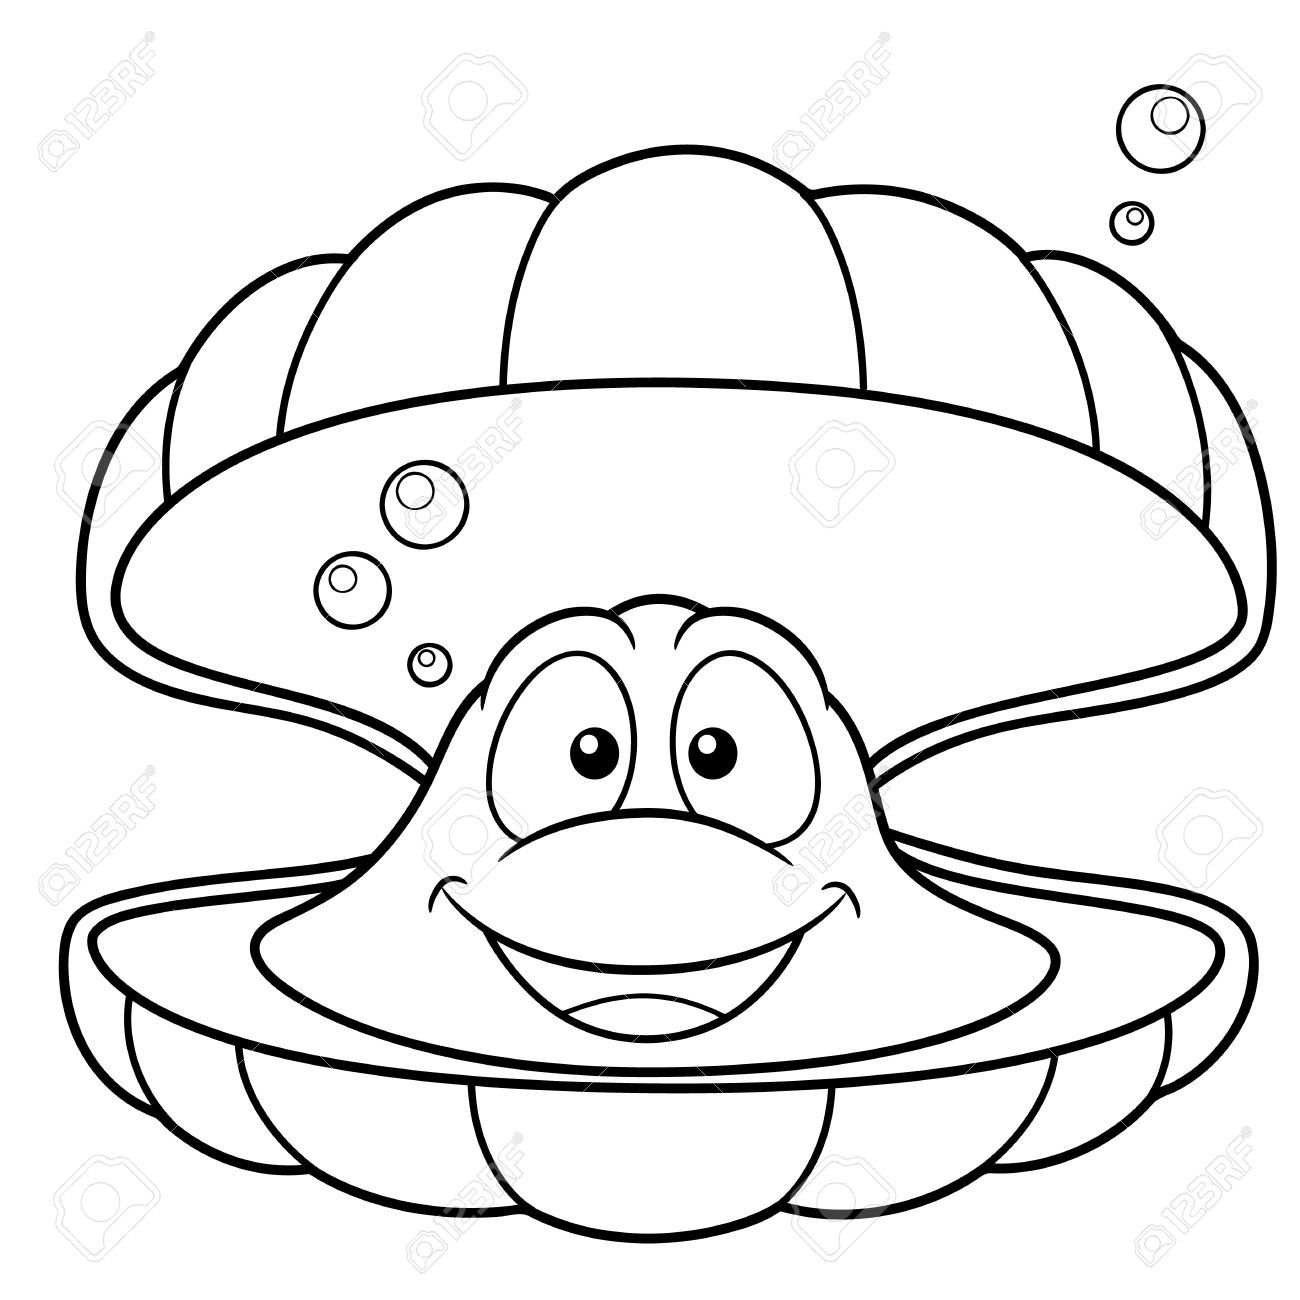 Ilustración Vectorial De Dibujos Animados Shell Coloring Book